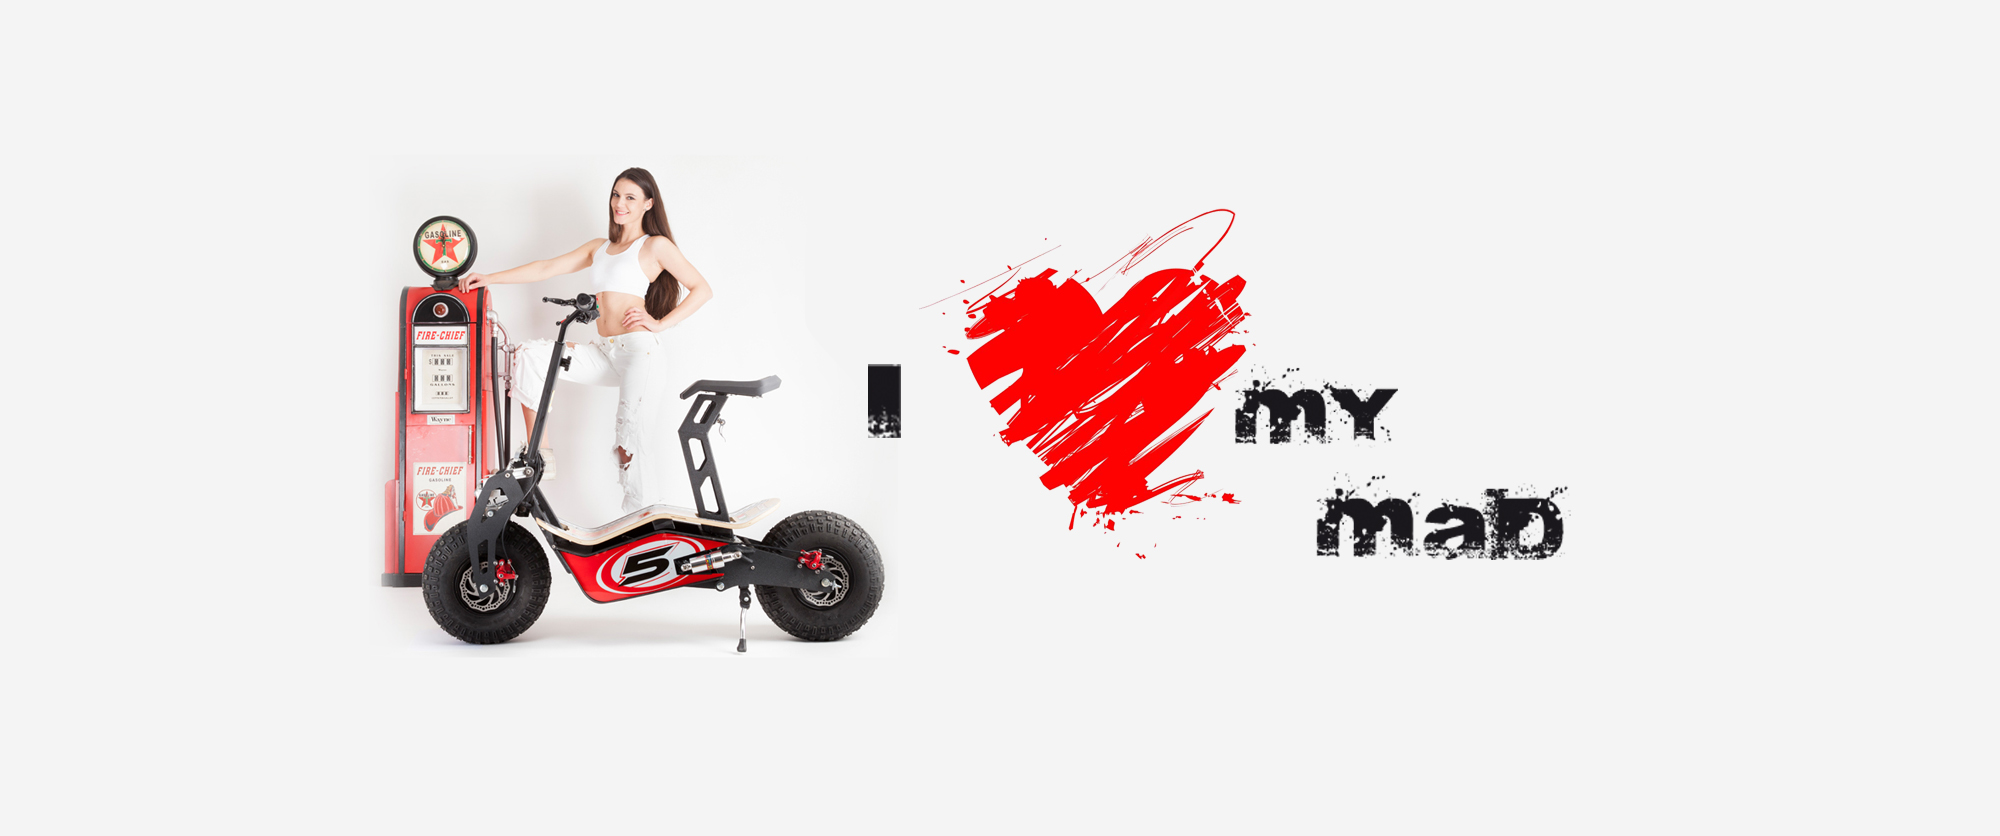 i-love-mad-the-new-velocifero-designed-by-alessandro-tartarini-italian-designer-eicma-2015